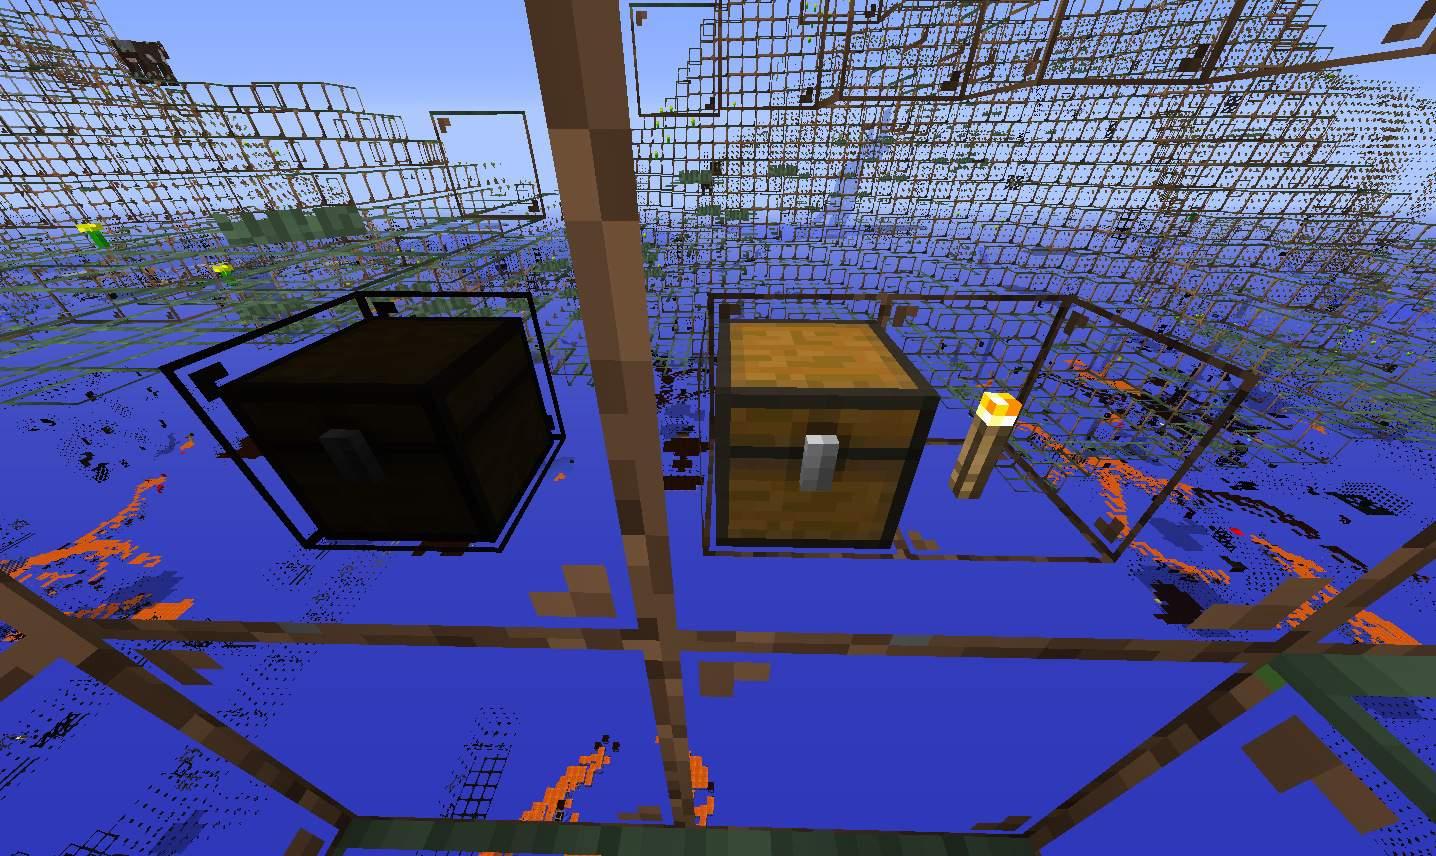 ban-xray-texture-minecraft-001